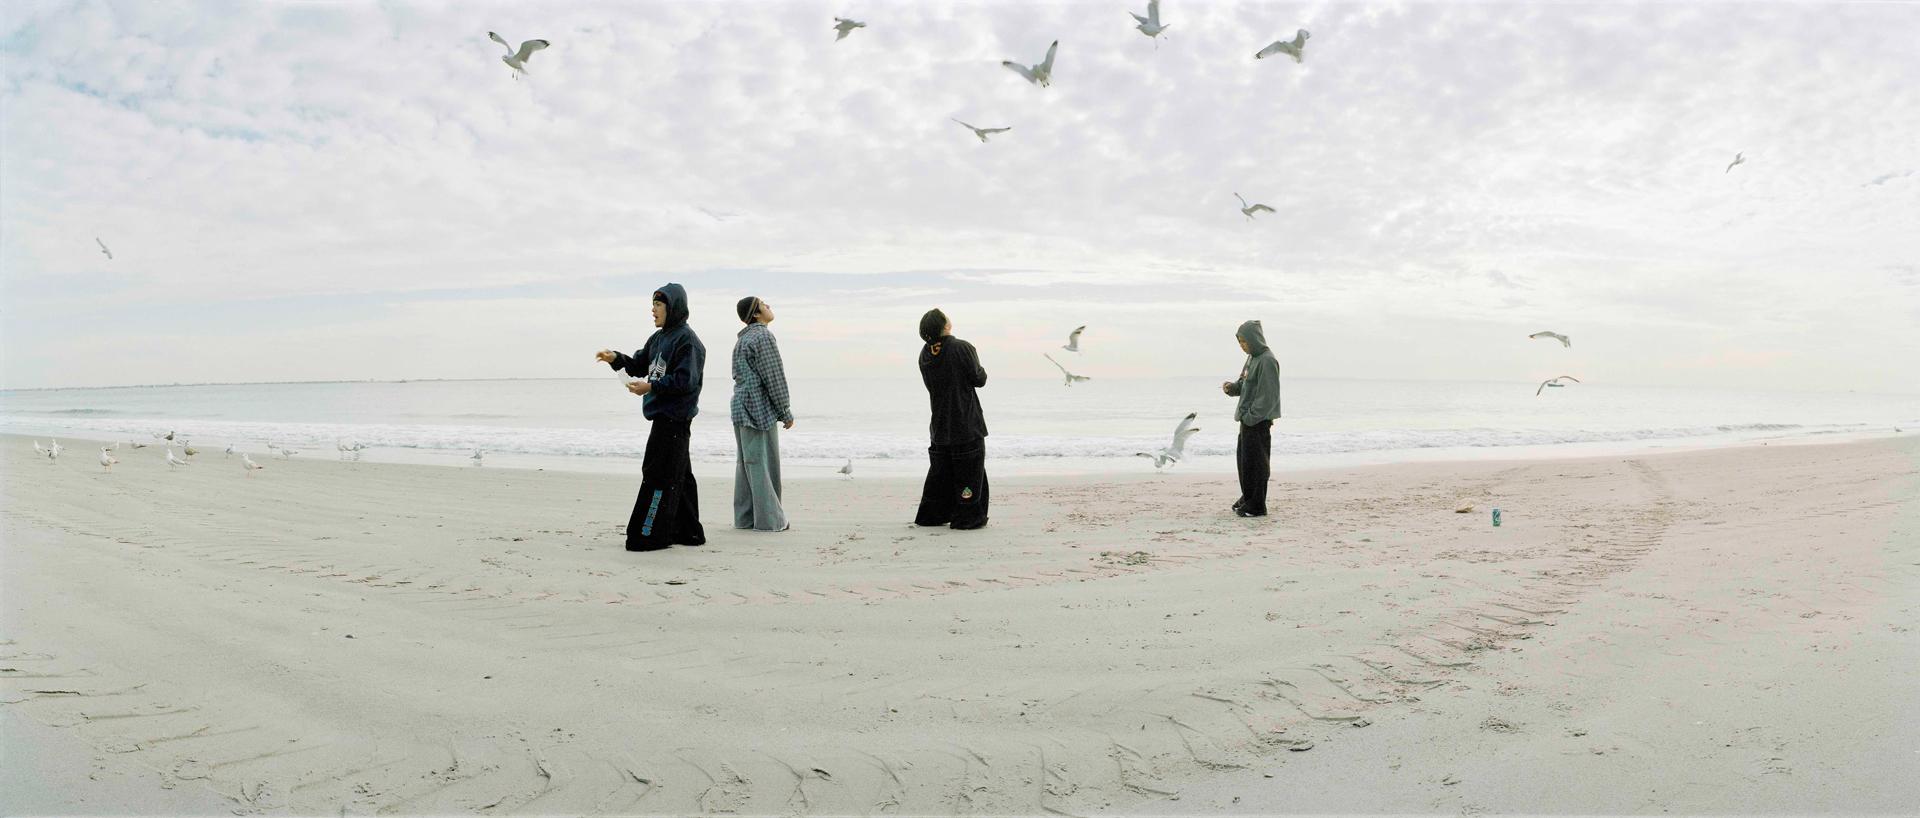 Jaakko Heikkilä: from the series  Innocent Shores  (Coney Island, New York), 2003